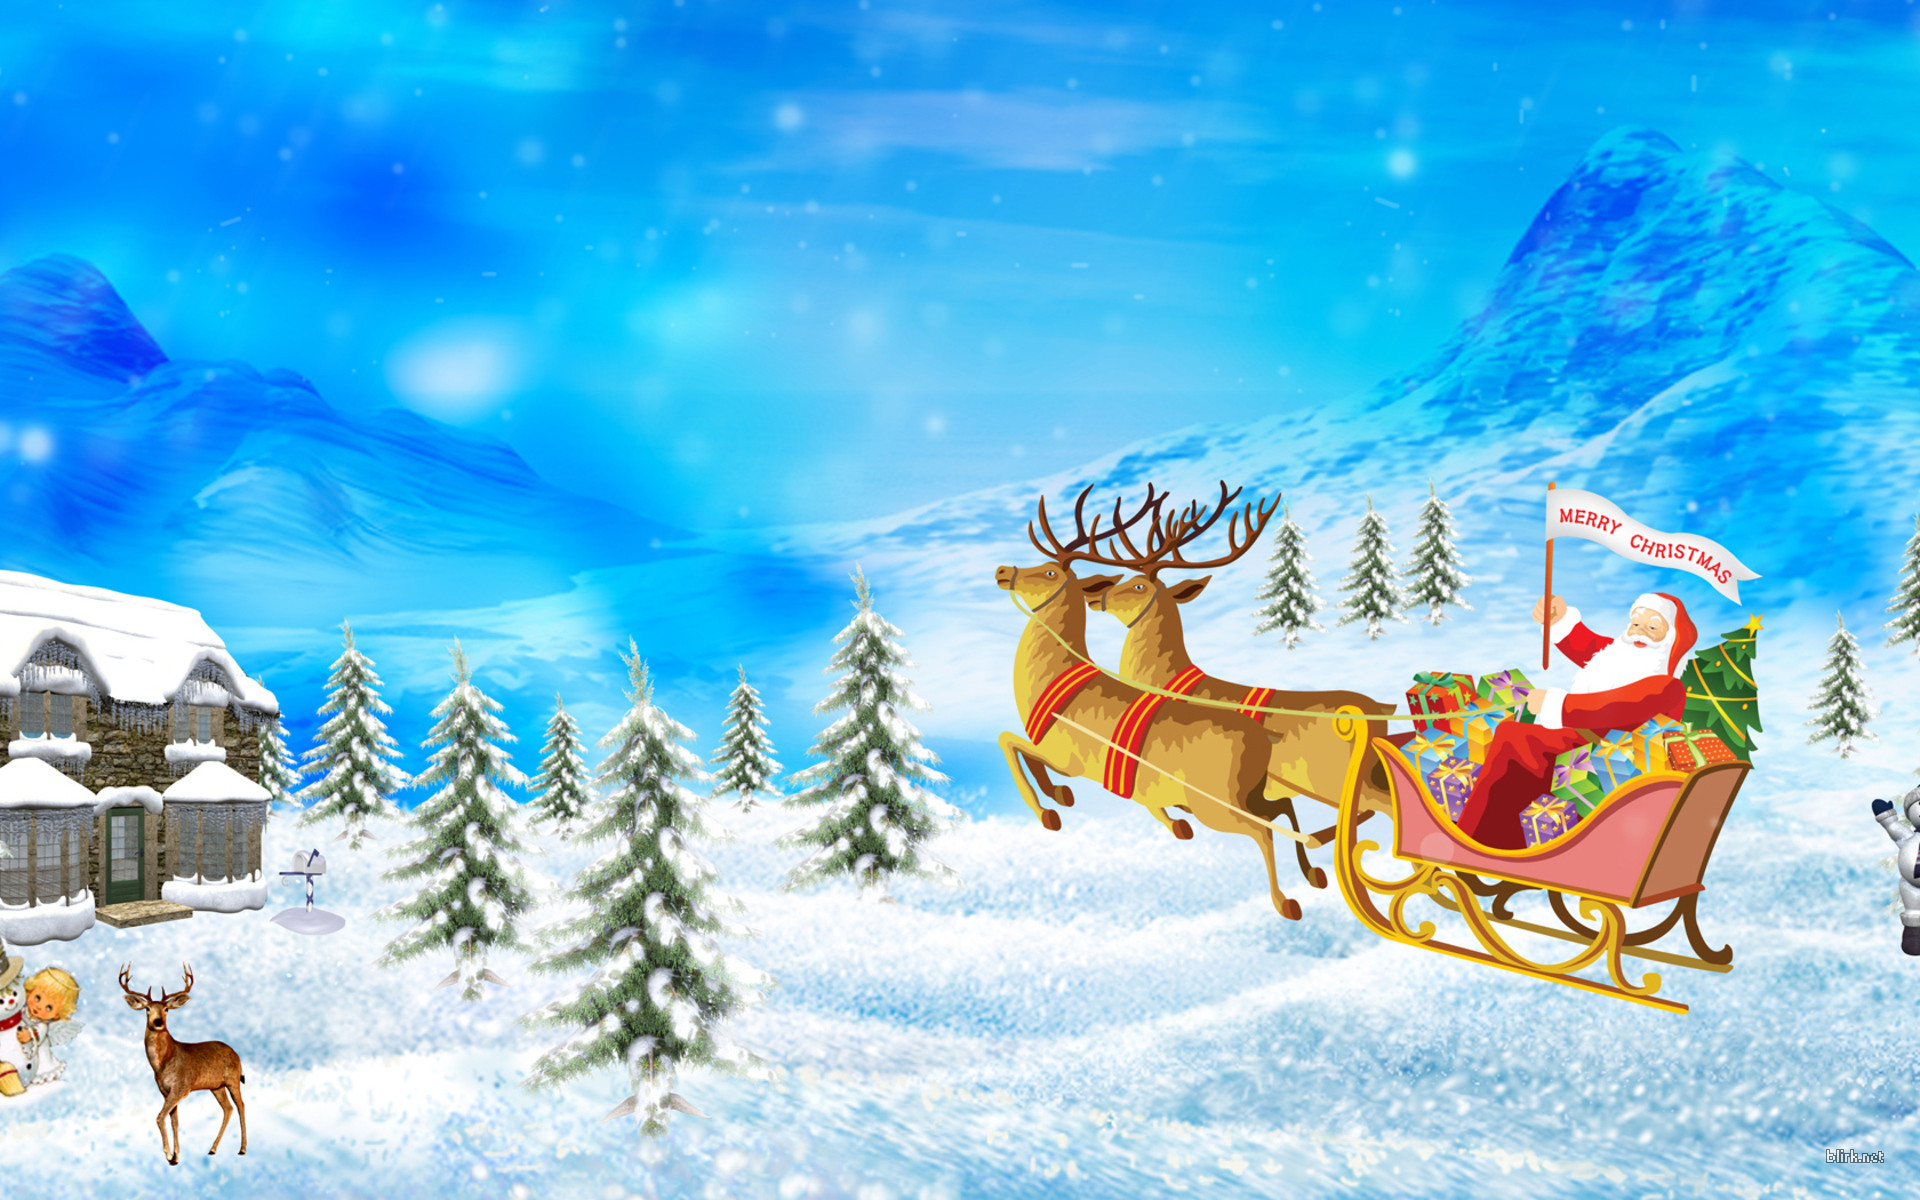 Песня Jingle Bells на английском: видео с текстом (субтитрами)